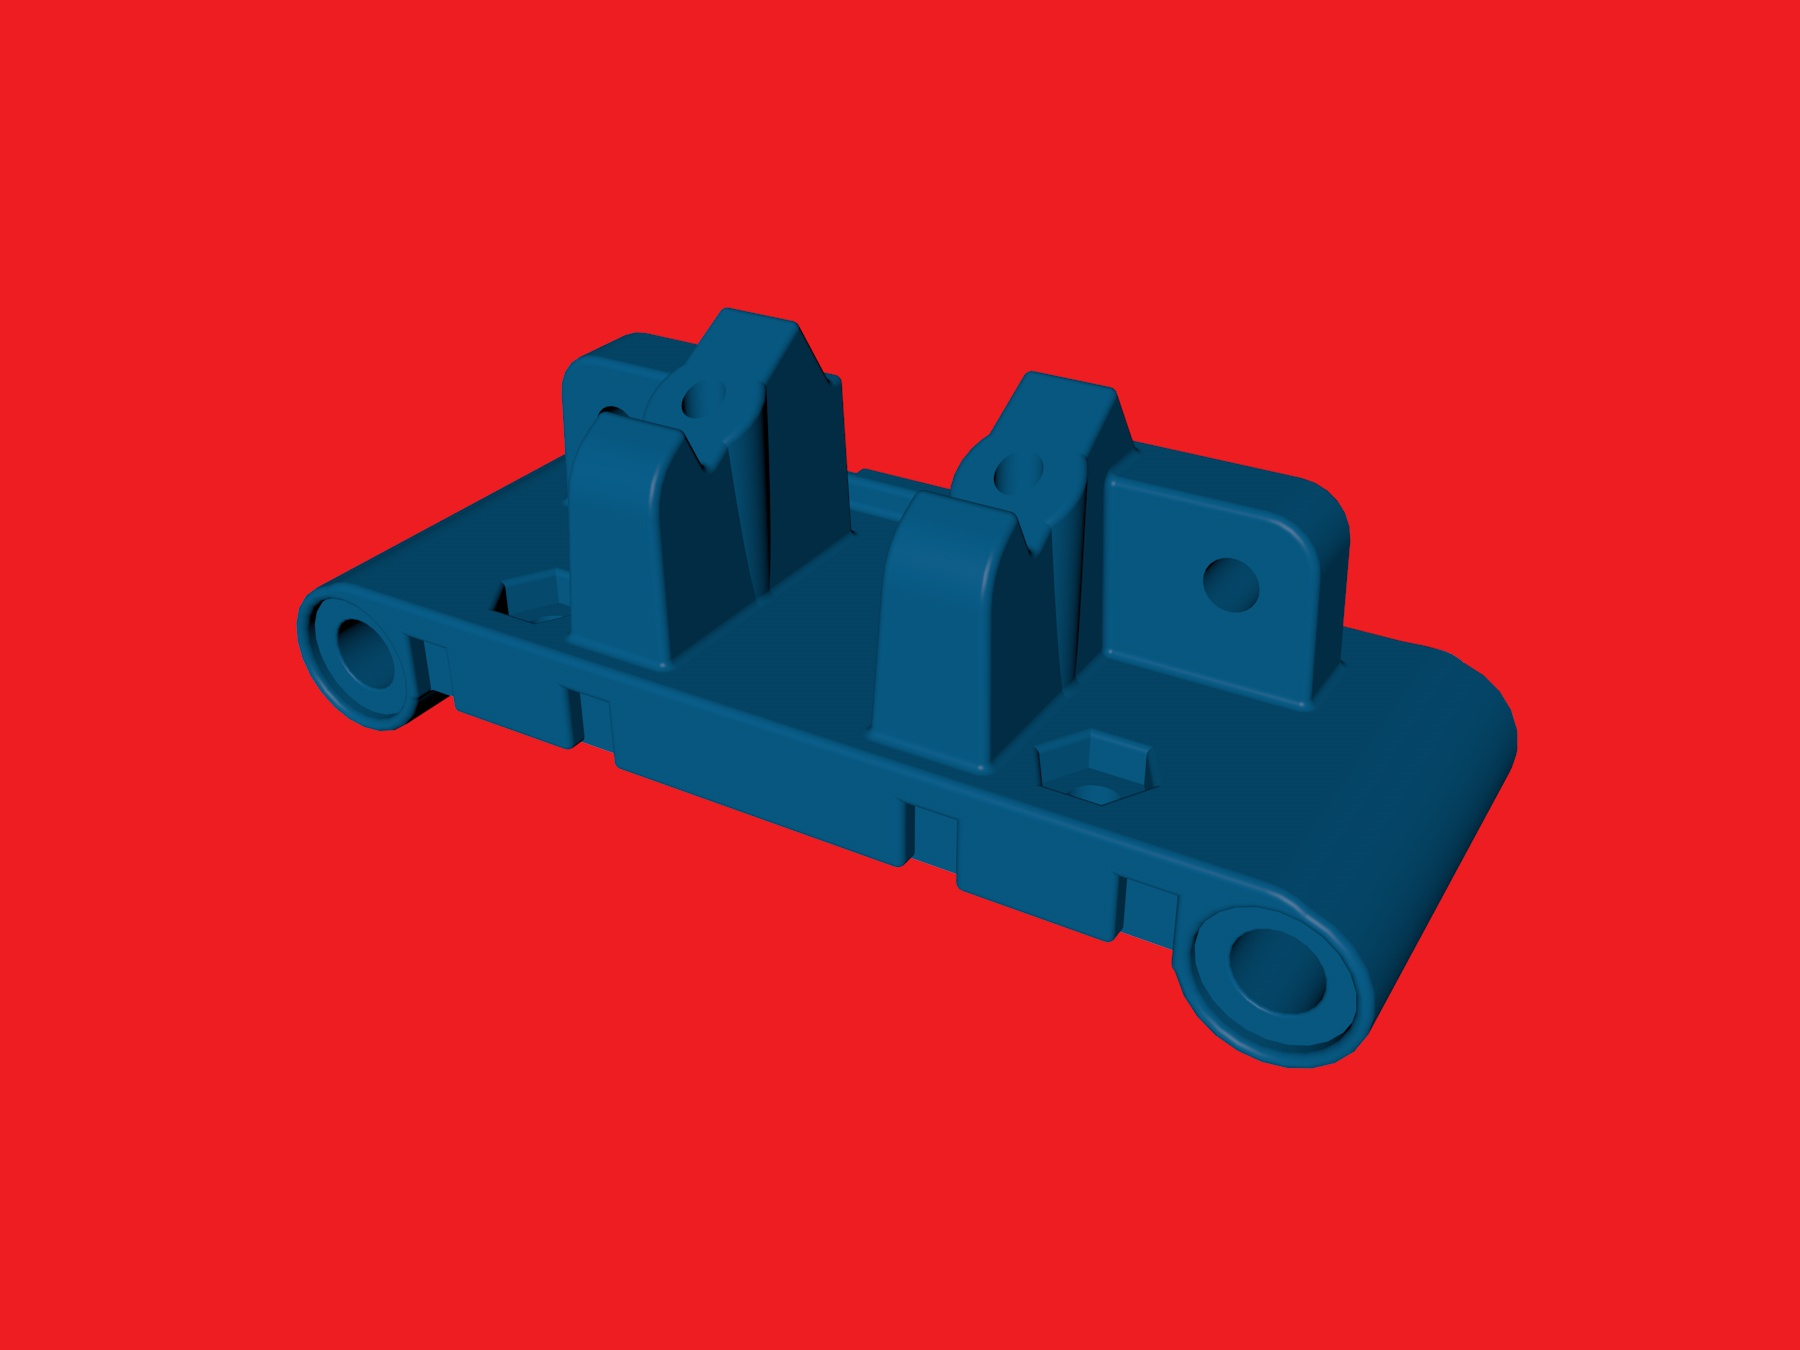 tamiya wrenchdog dyna storm dyna blaster tr-15t db211x aluminum 3d print pa12 bulkhead d5